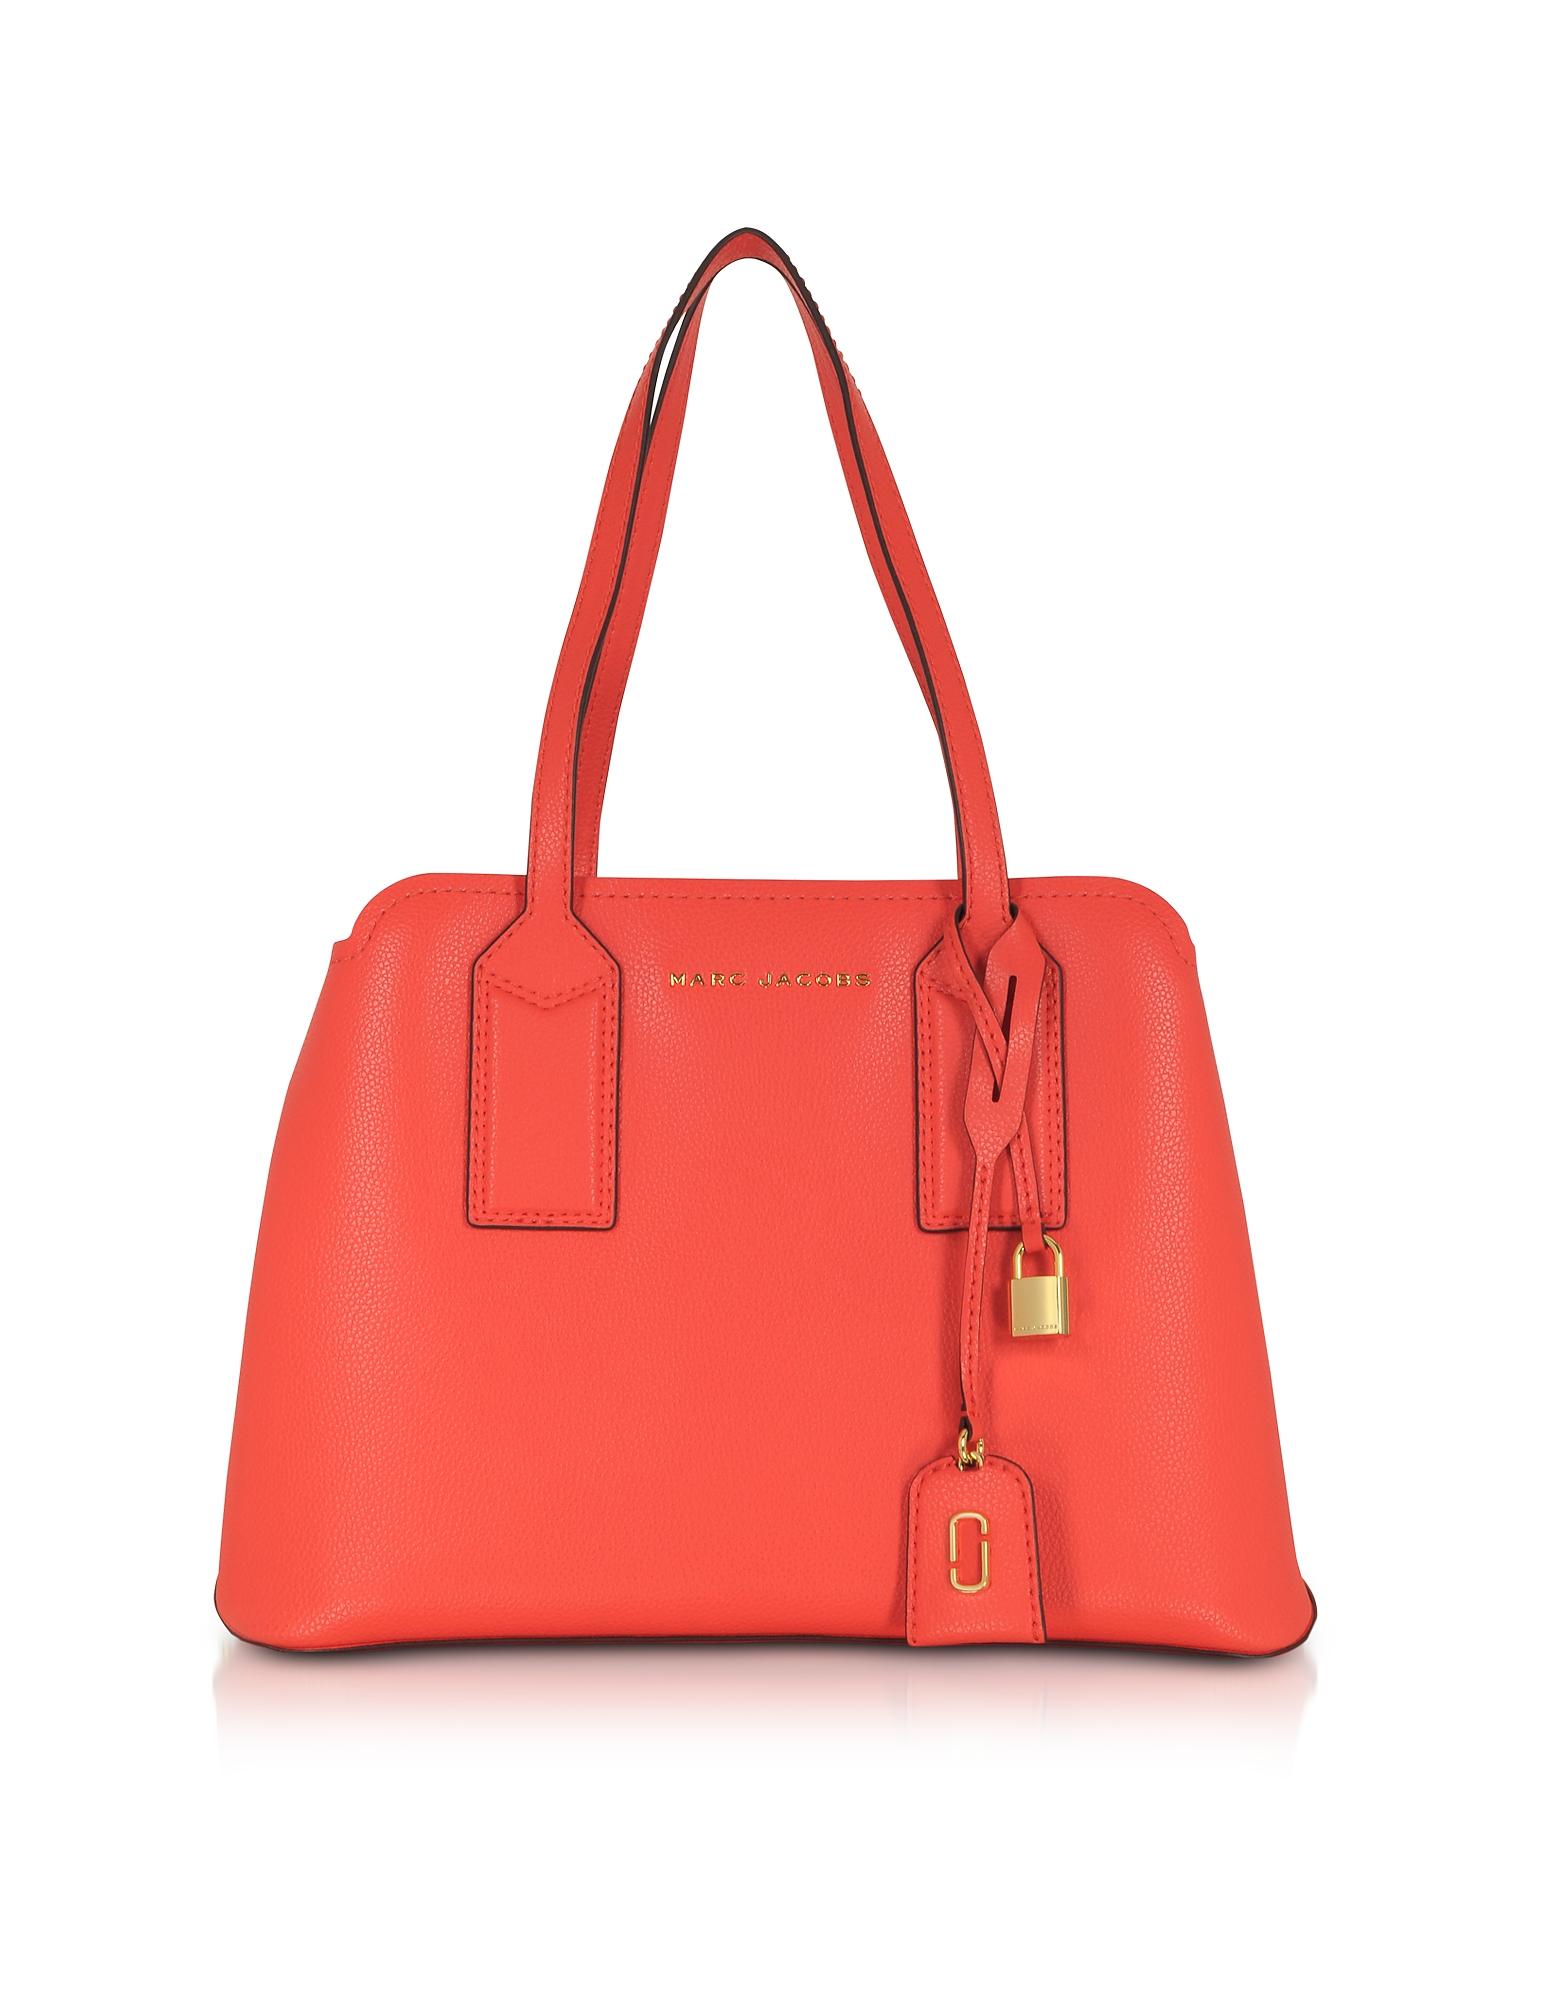 Marc Jacobs Handbags, The Editor Leather Tote Bag